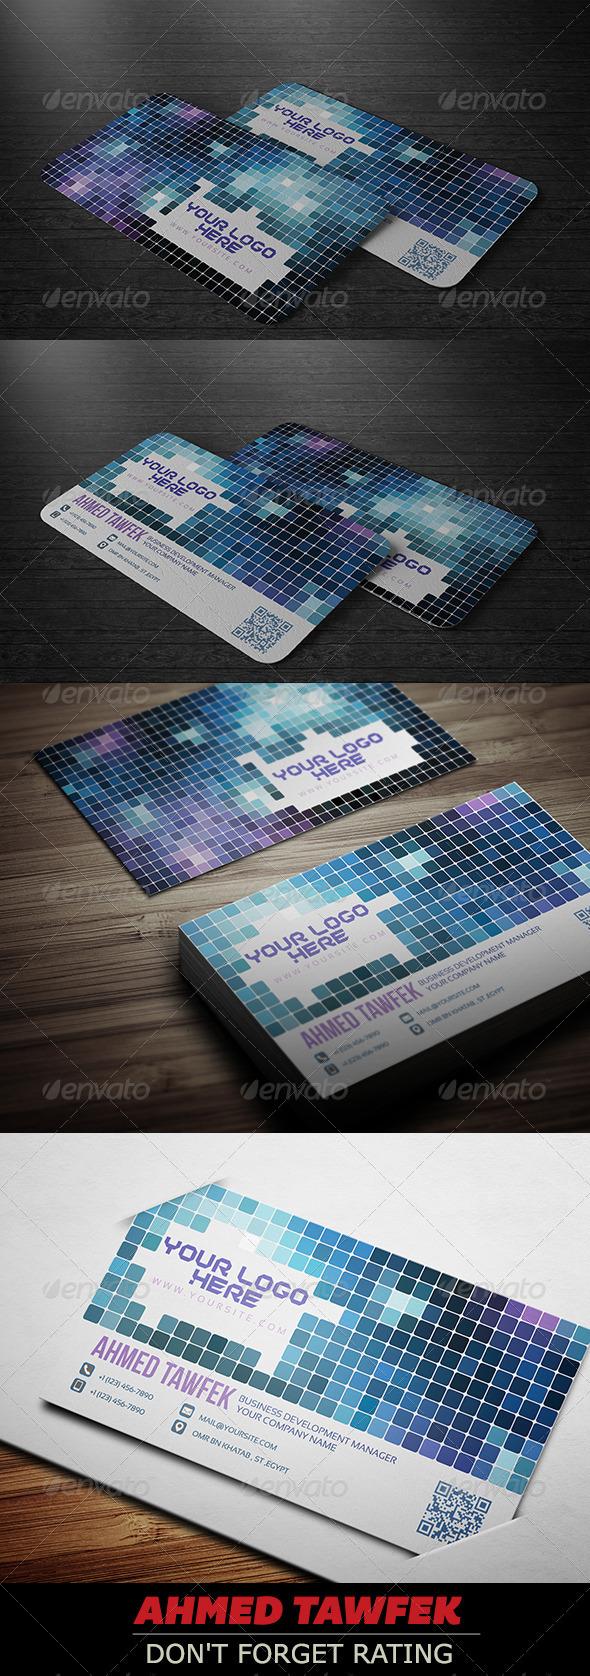 GraphicRiver Design Studio Business Card 4353751